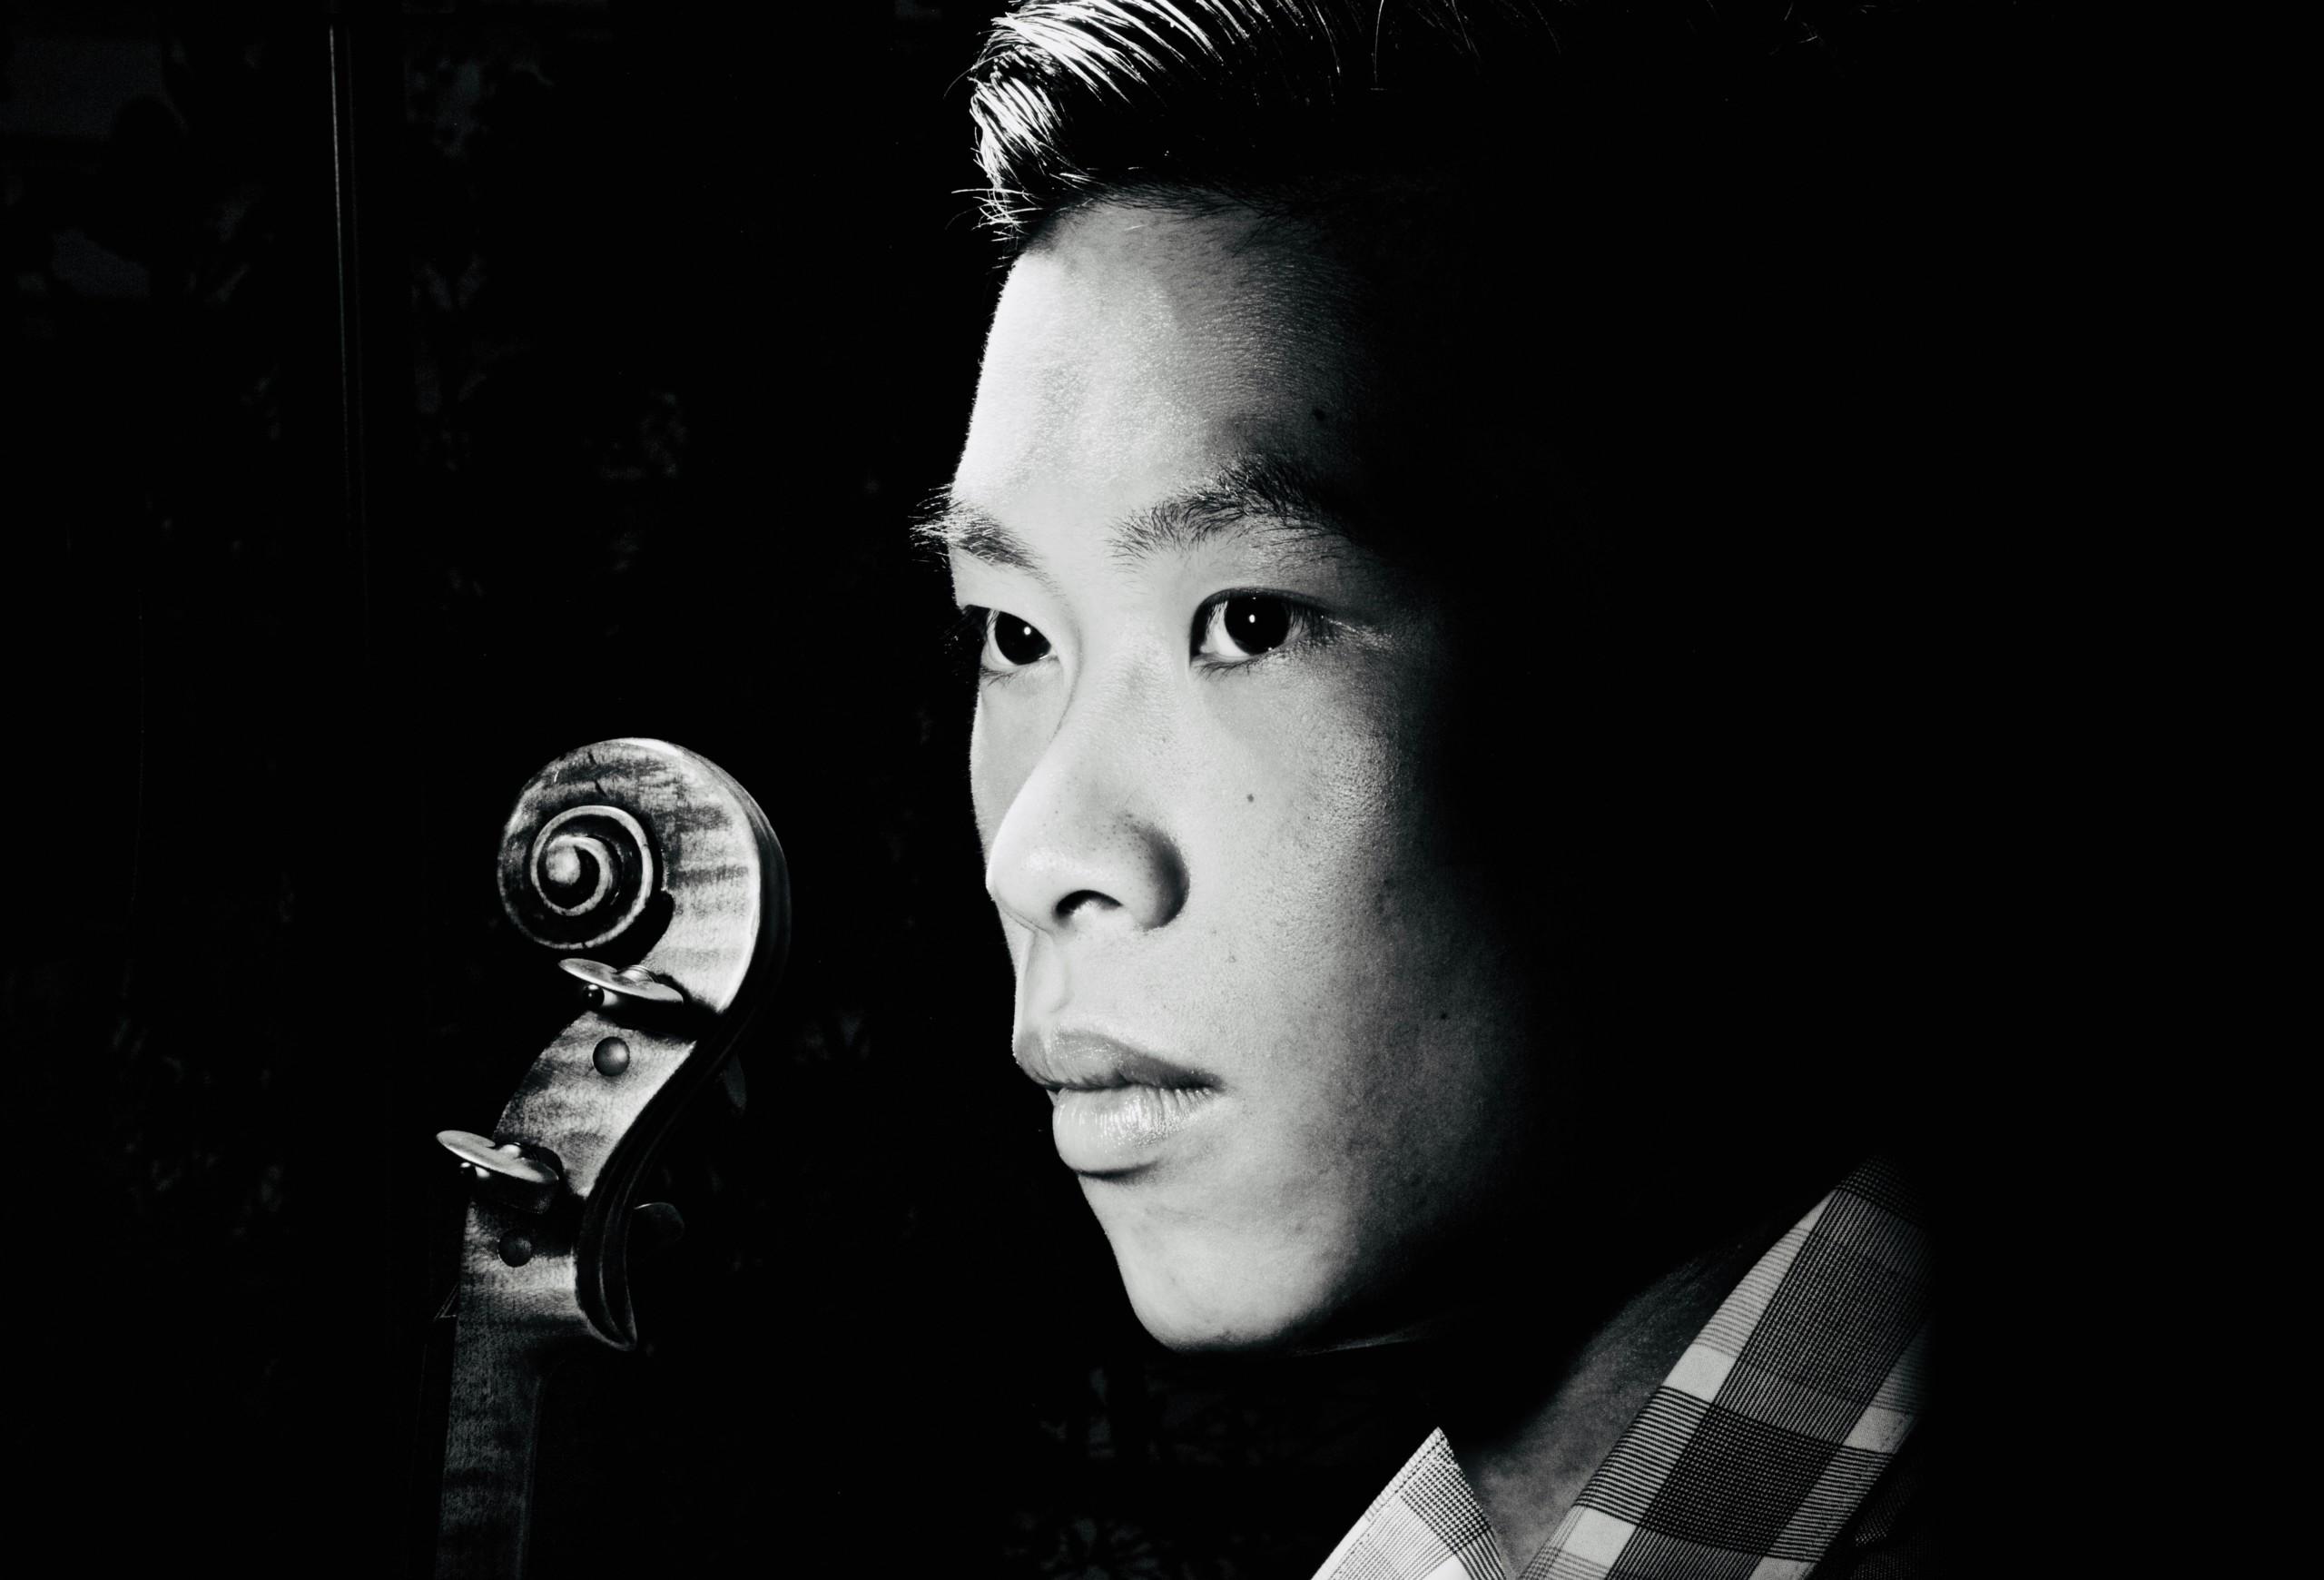 WQXR's Midday Masterpieces: Kerson Leong